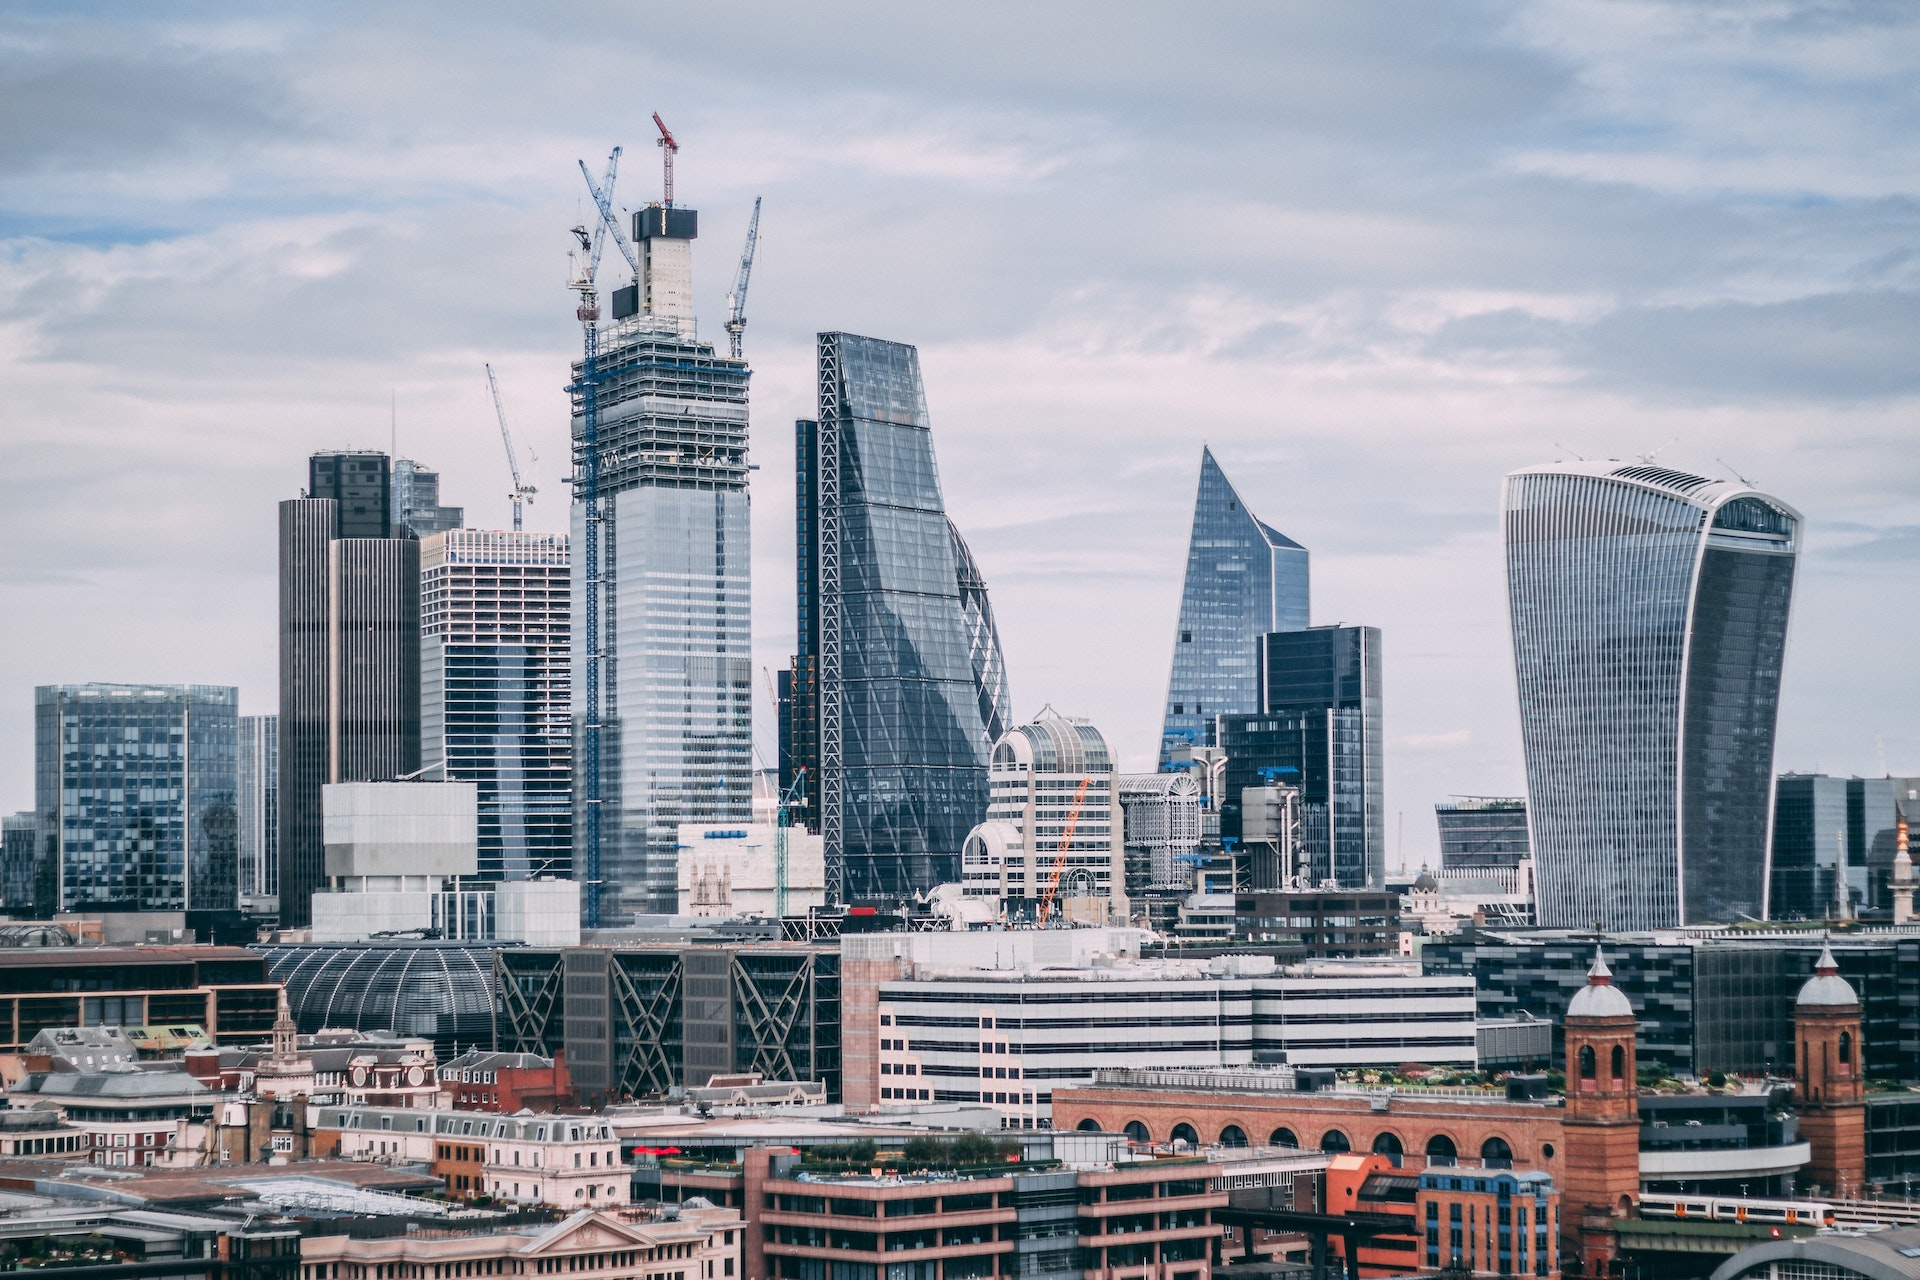 Photo: London, United Kingdom | Credit: João Barbosa, YFS Magazine, Unsplash